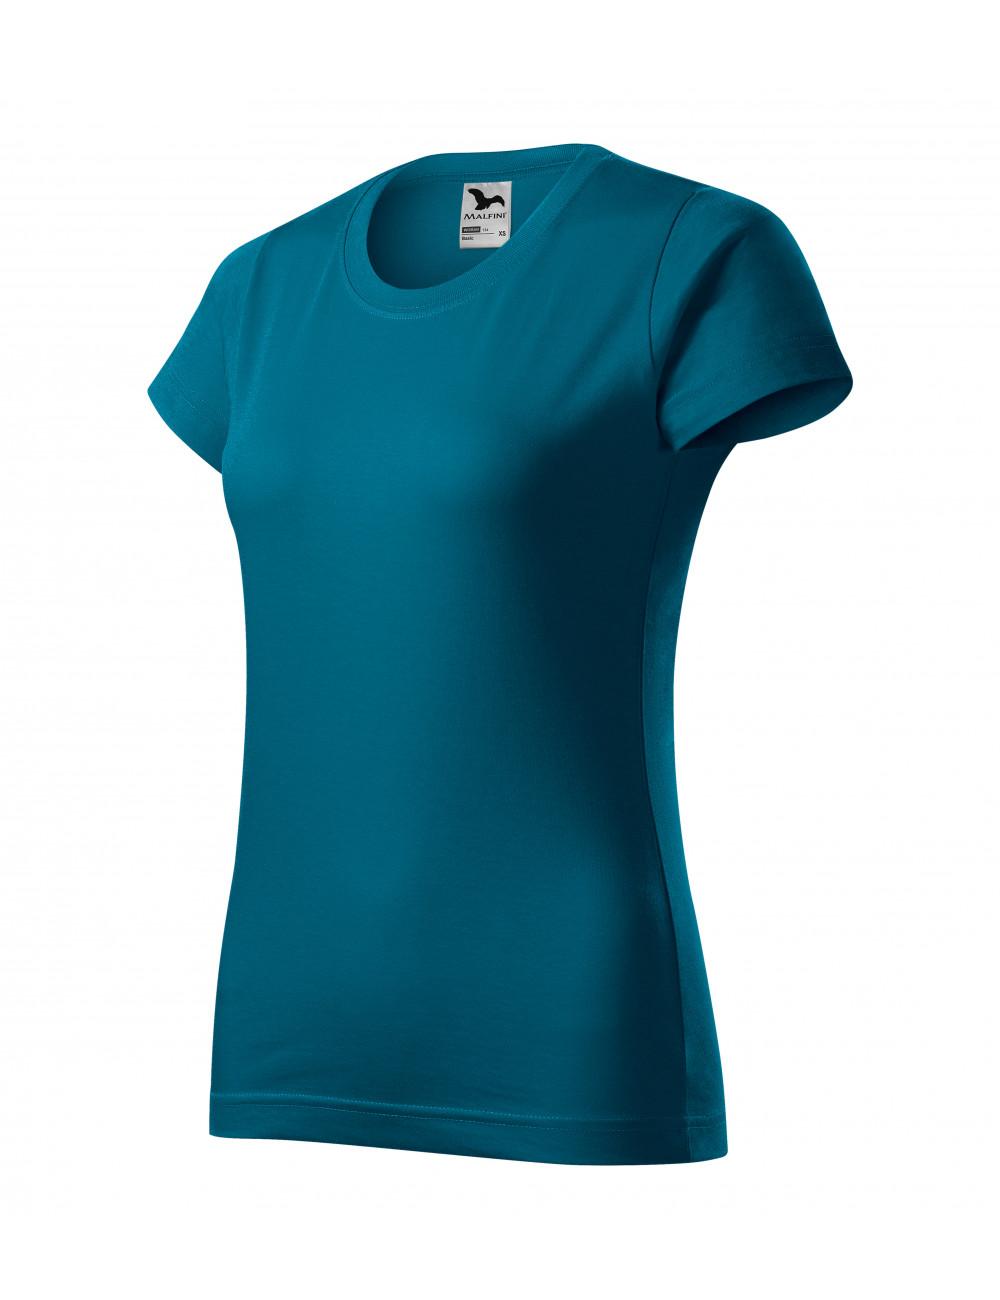 Adler MALFINI Koszulka damska Basic 134 petrol blue